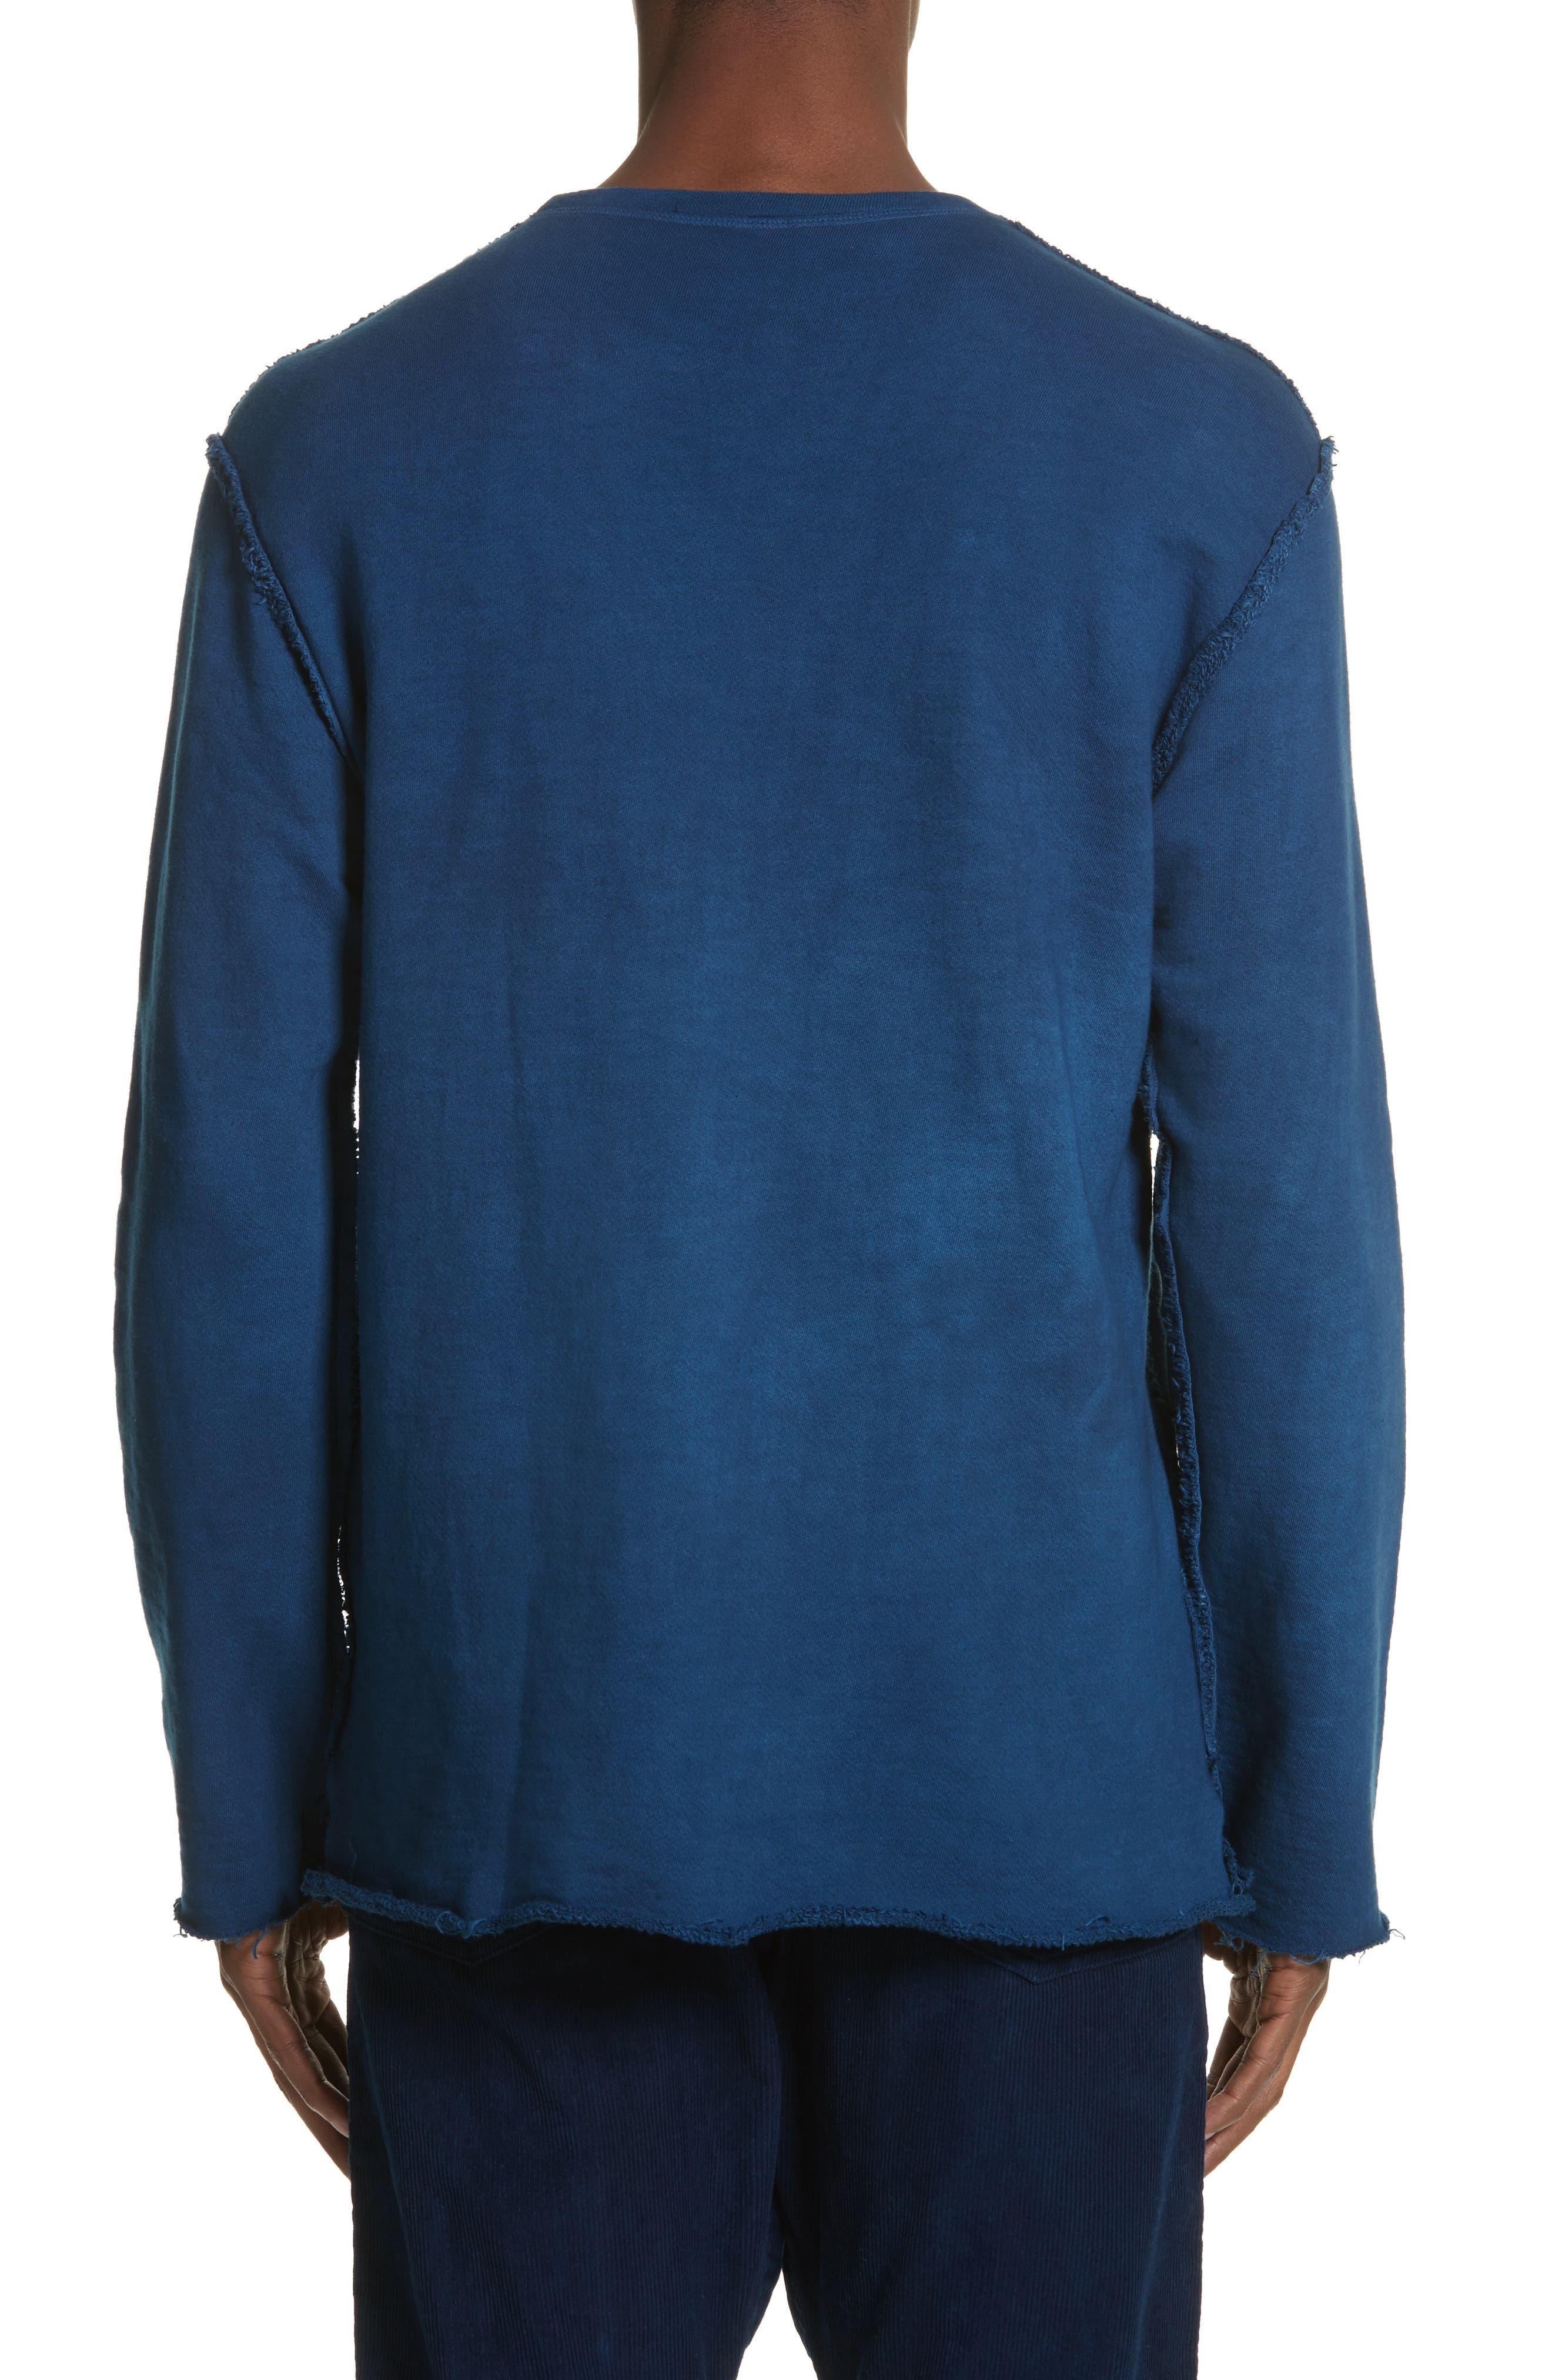 Malibu Reversible Sweatshirt,                             Alternate thumbnail 3, color,                             Indigo